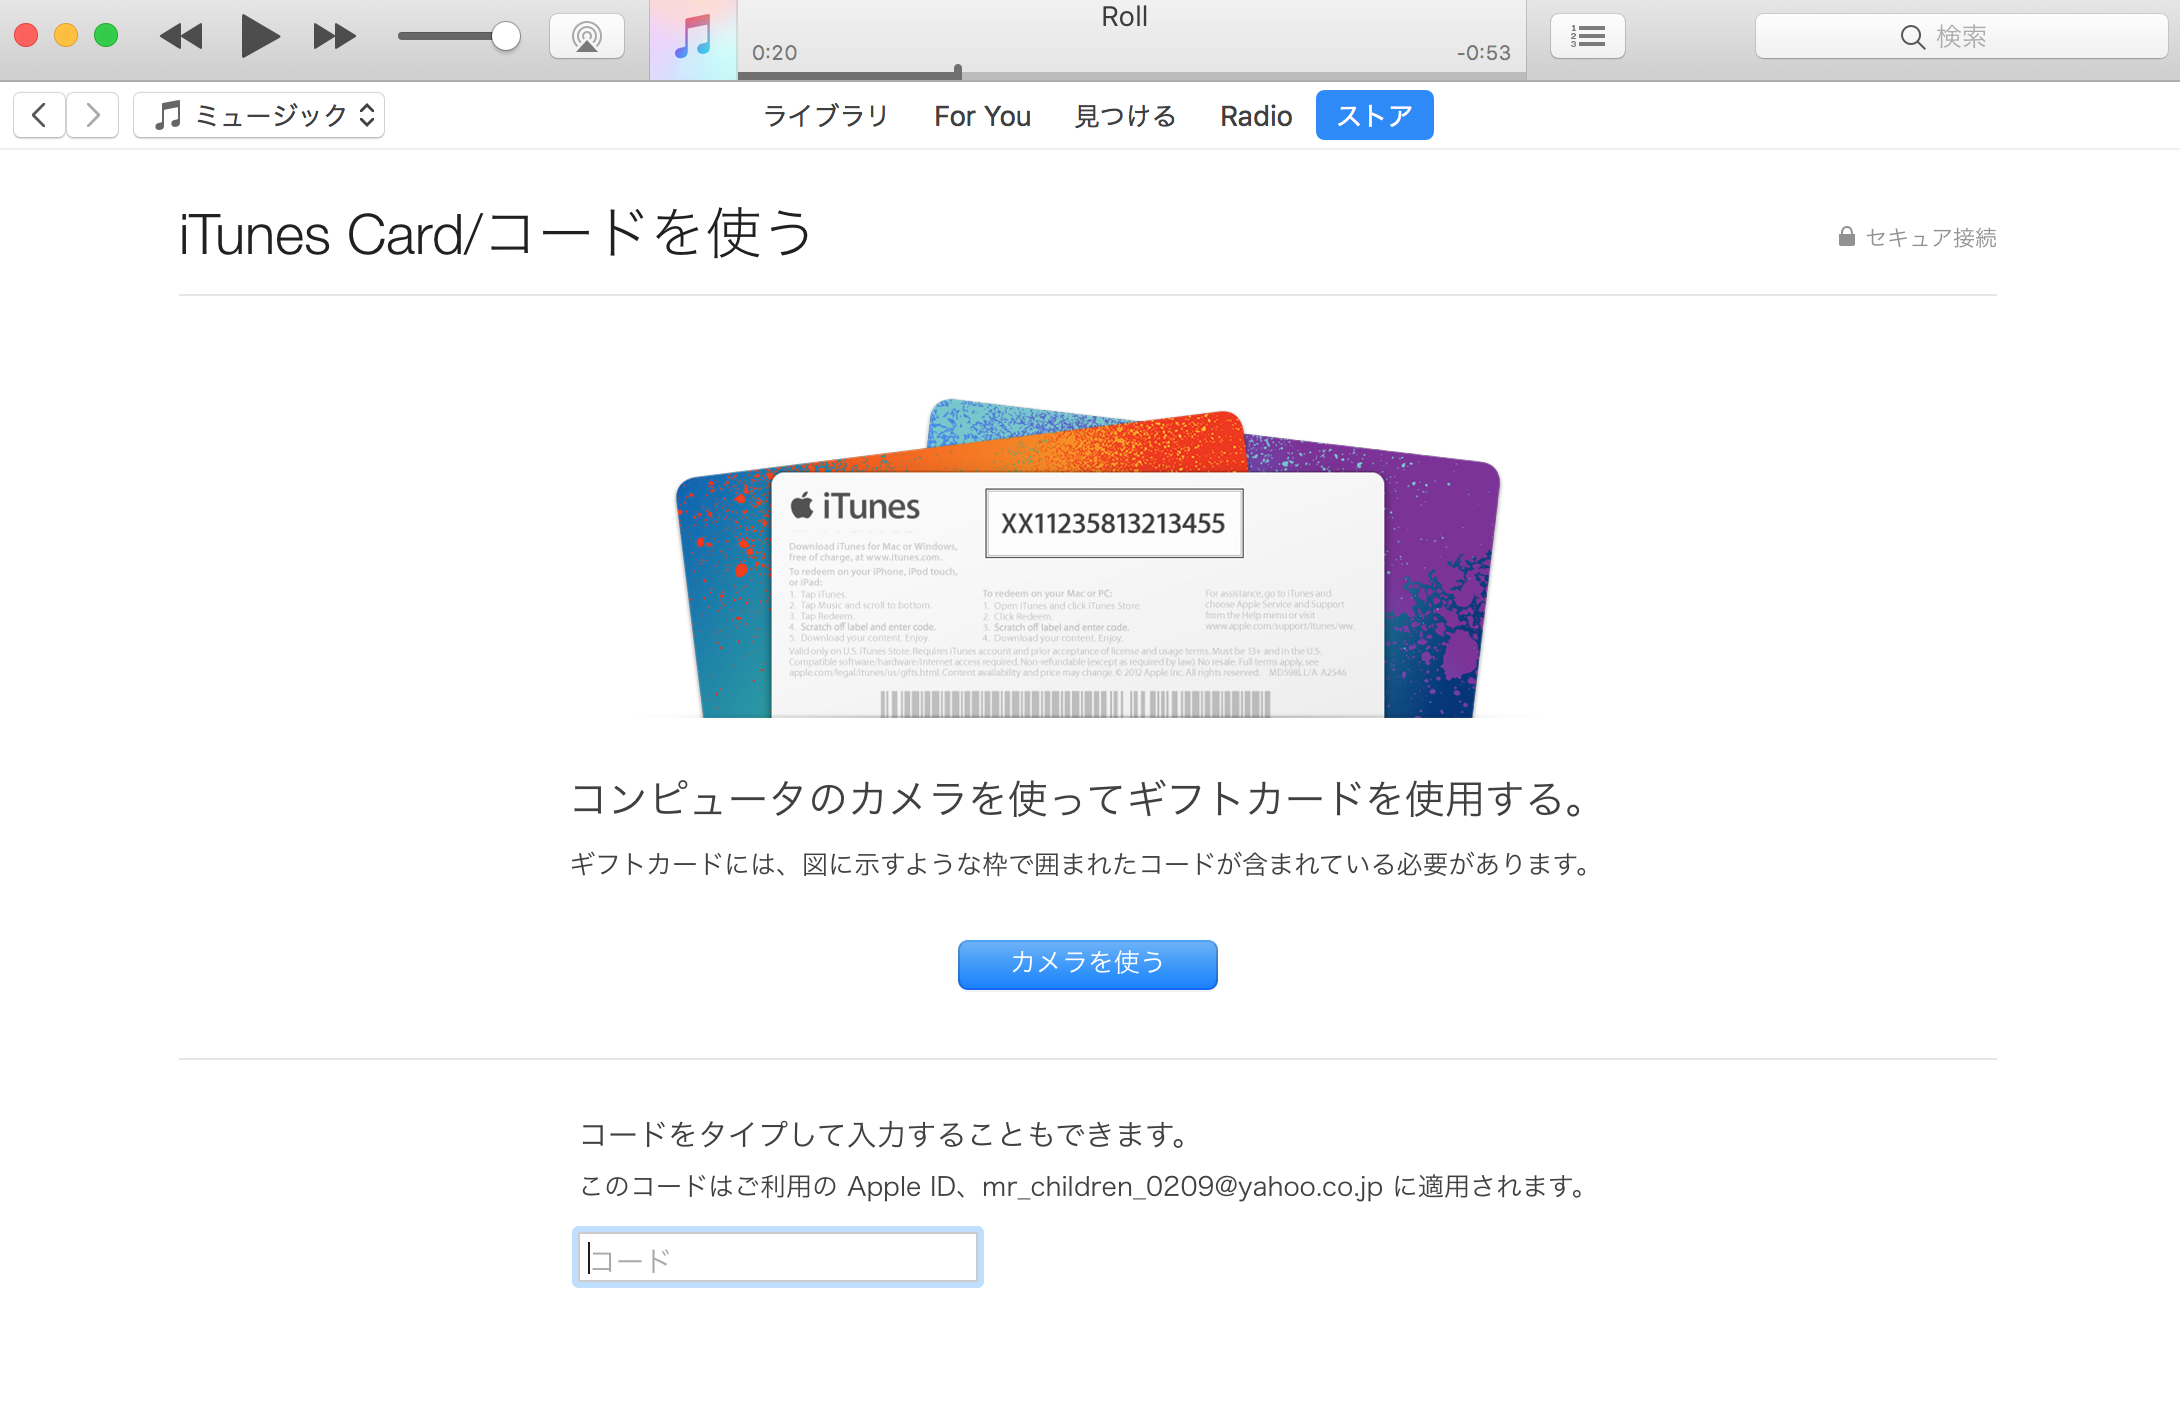 iTunesカード 2